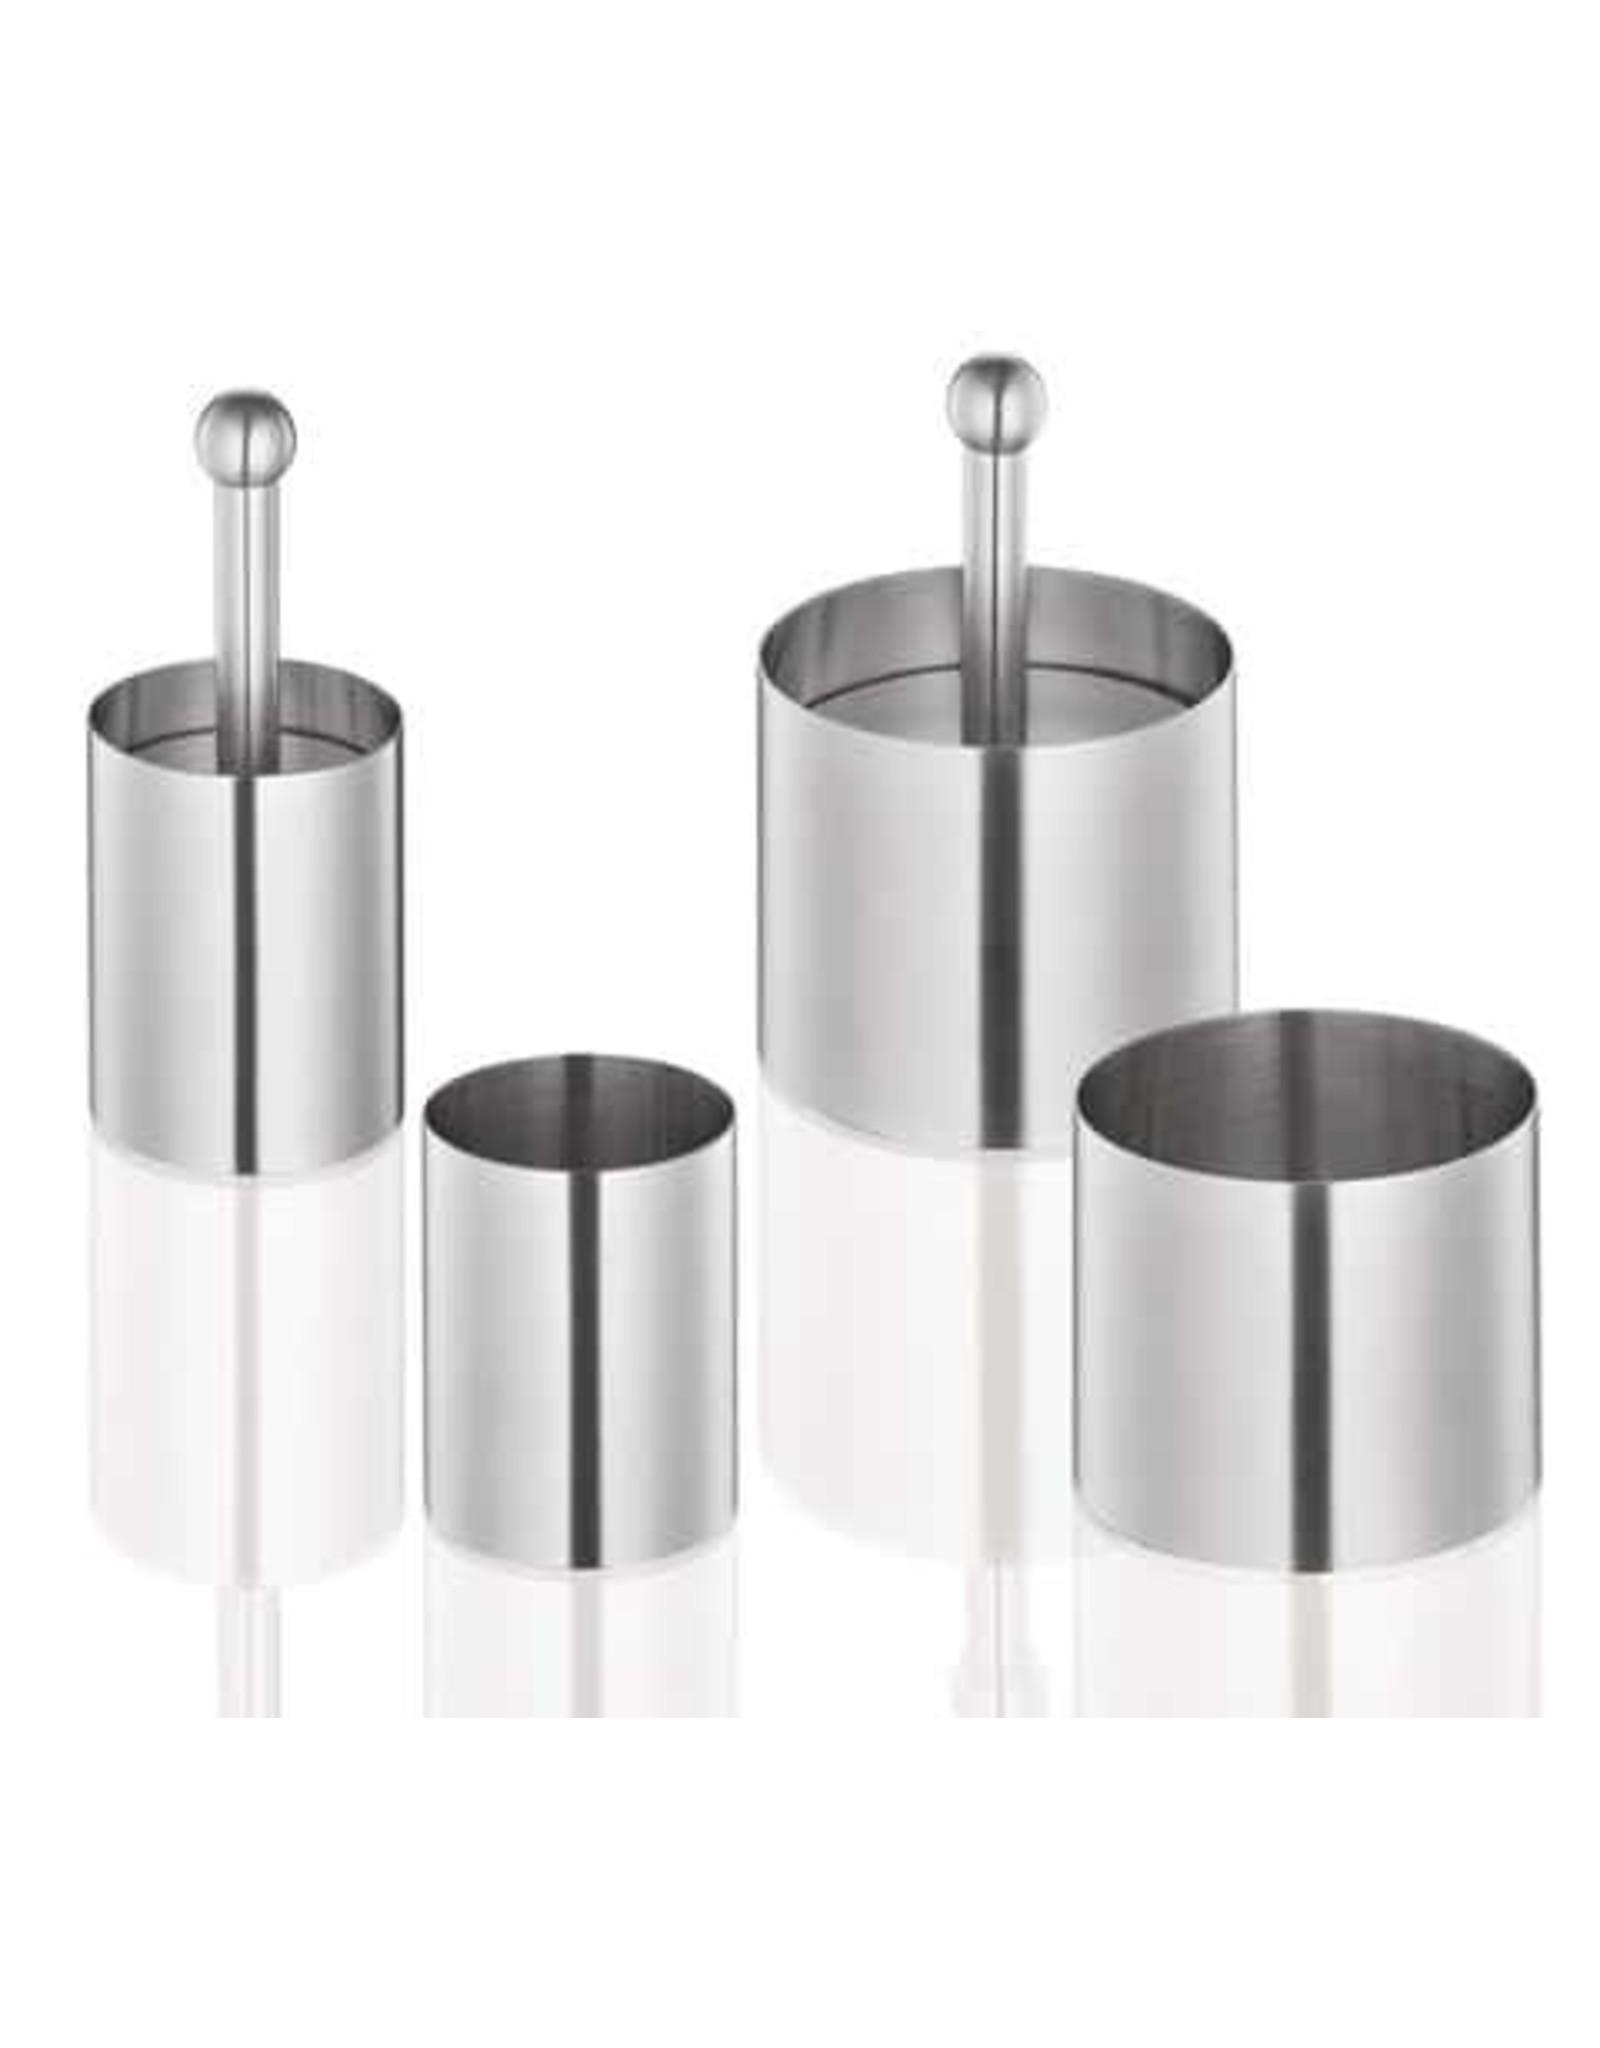 Frieling FRIEL S/S Ring Molds 6pc set